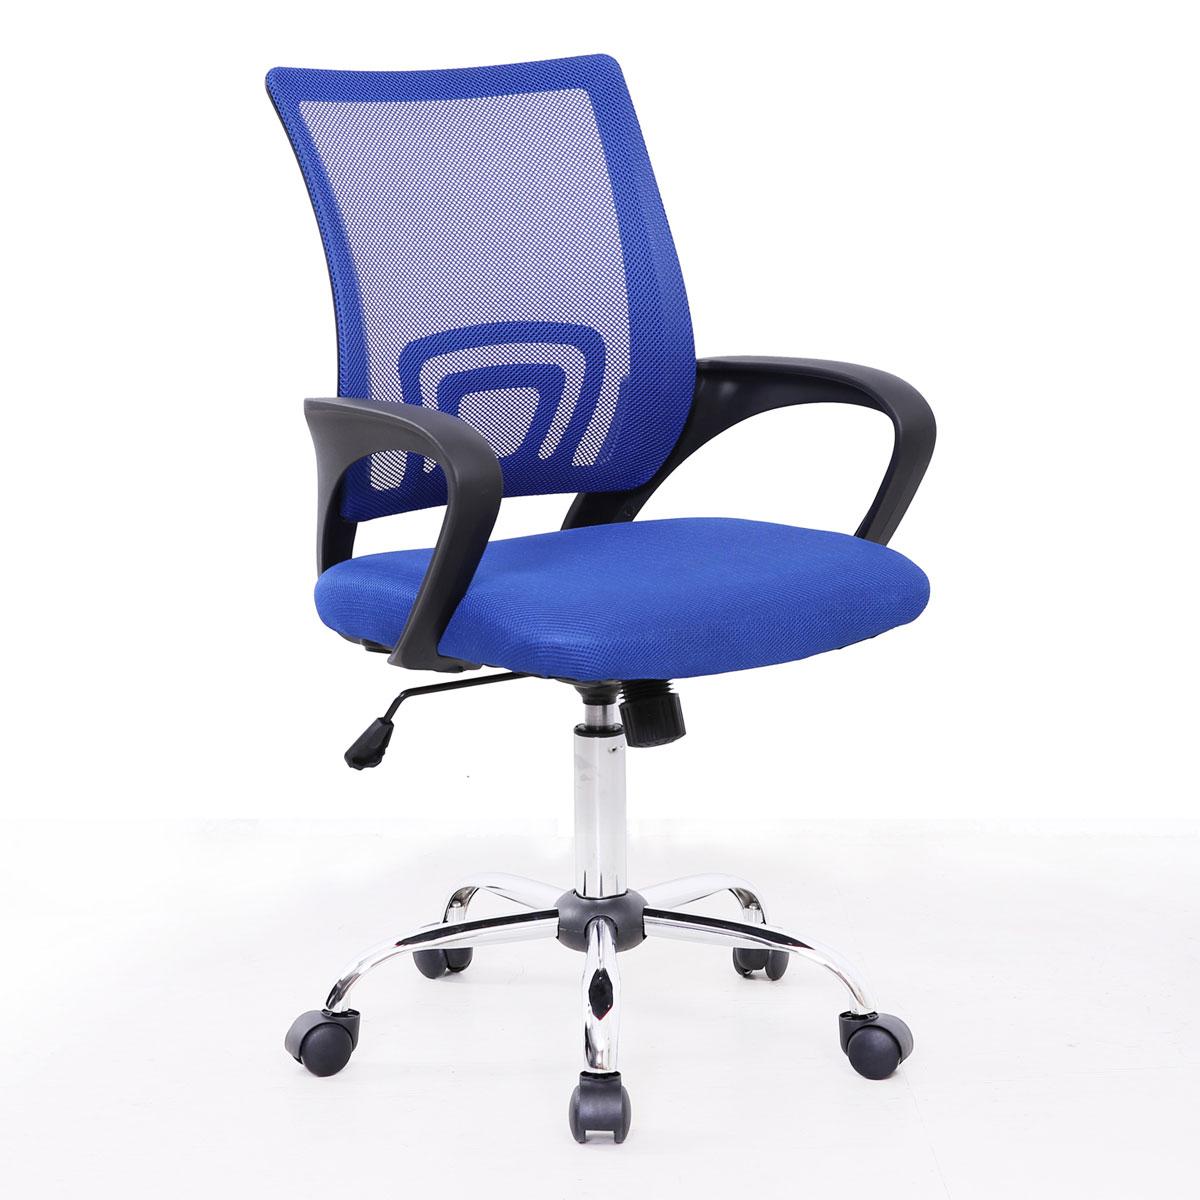 91202 SVITA Kinder Schreibtischstuhl Netzbezug blau